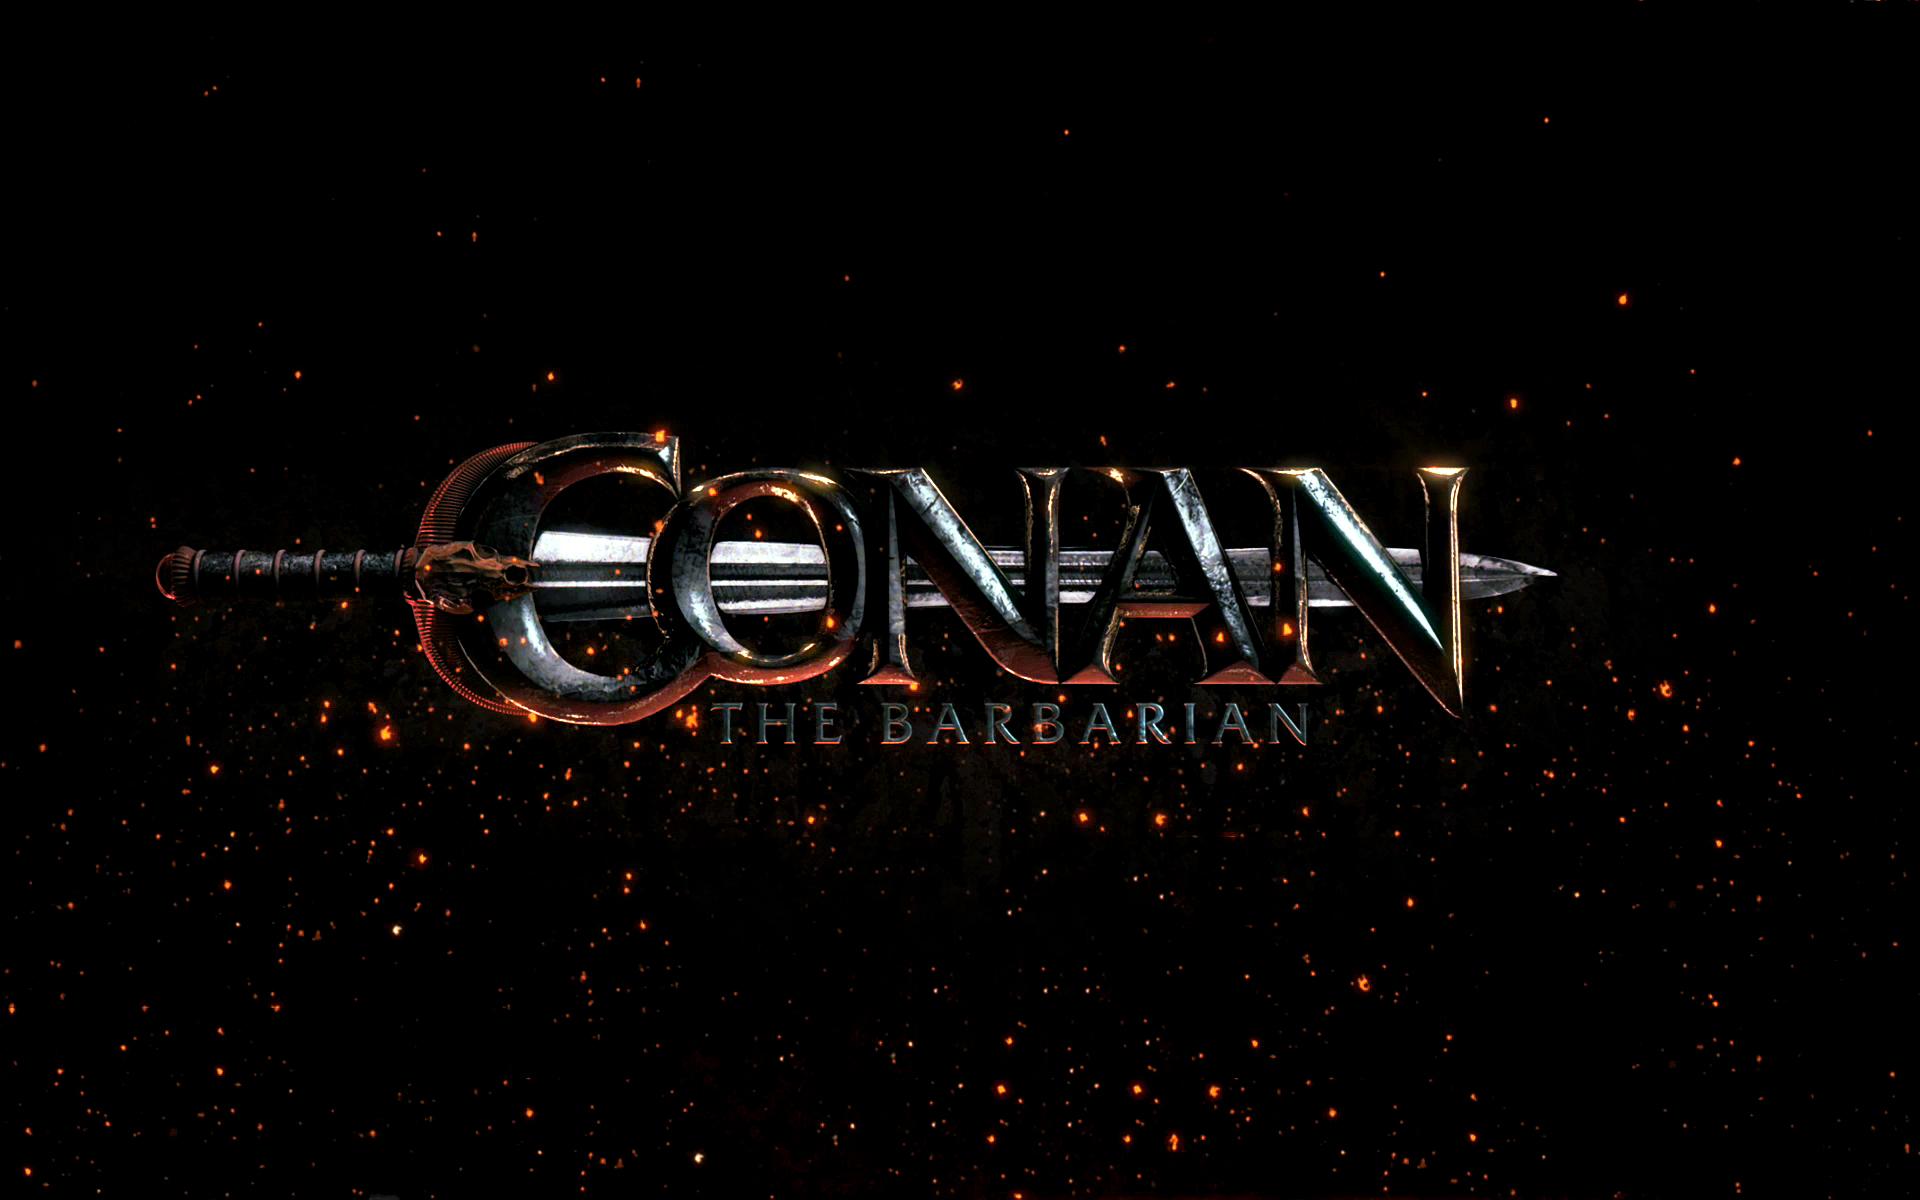 Conan The Barbarian Wallpapers 1920x1200jpg 1920x1200